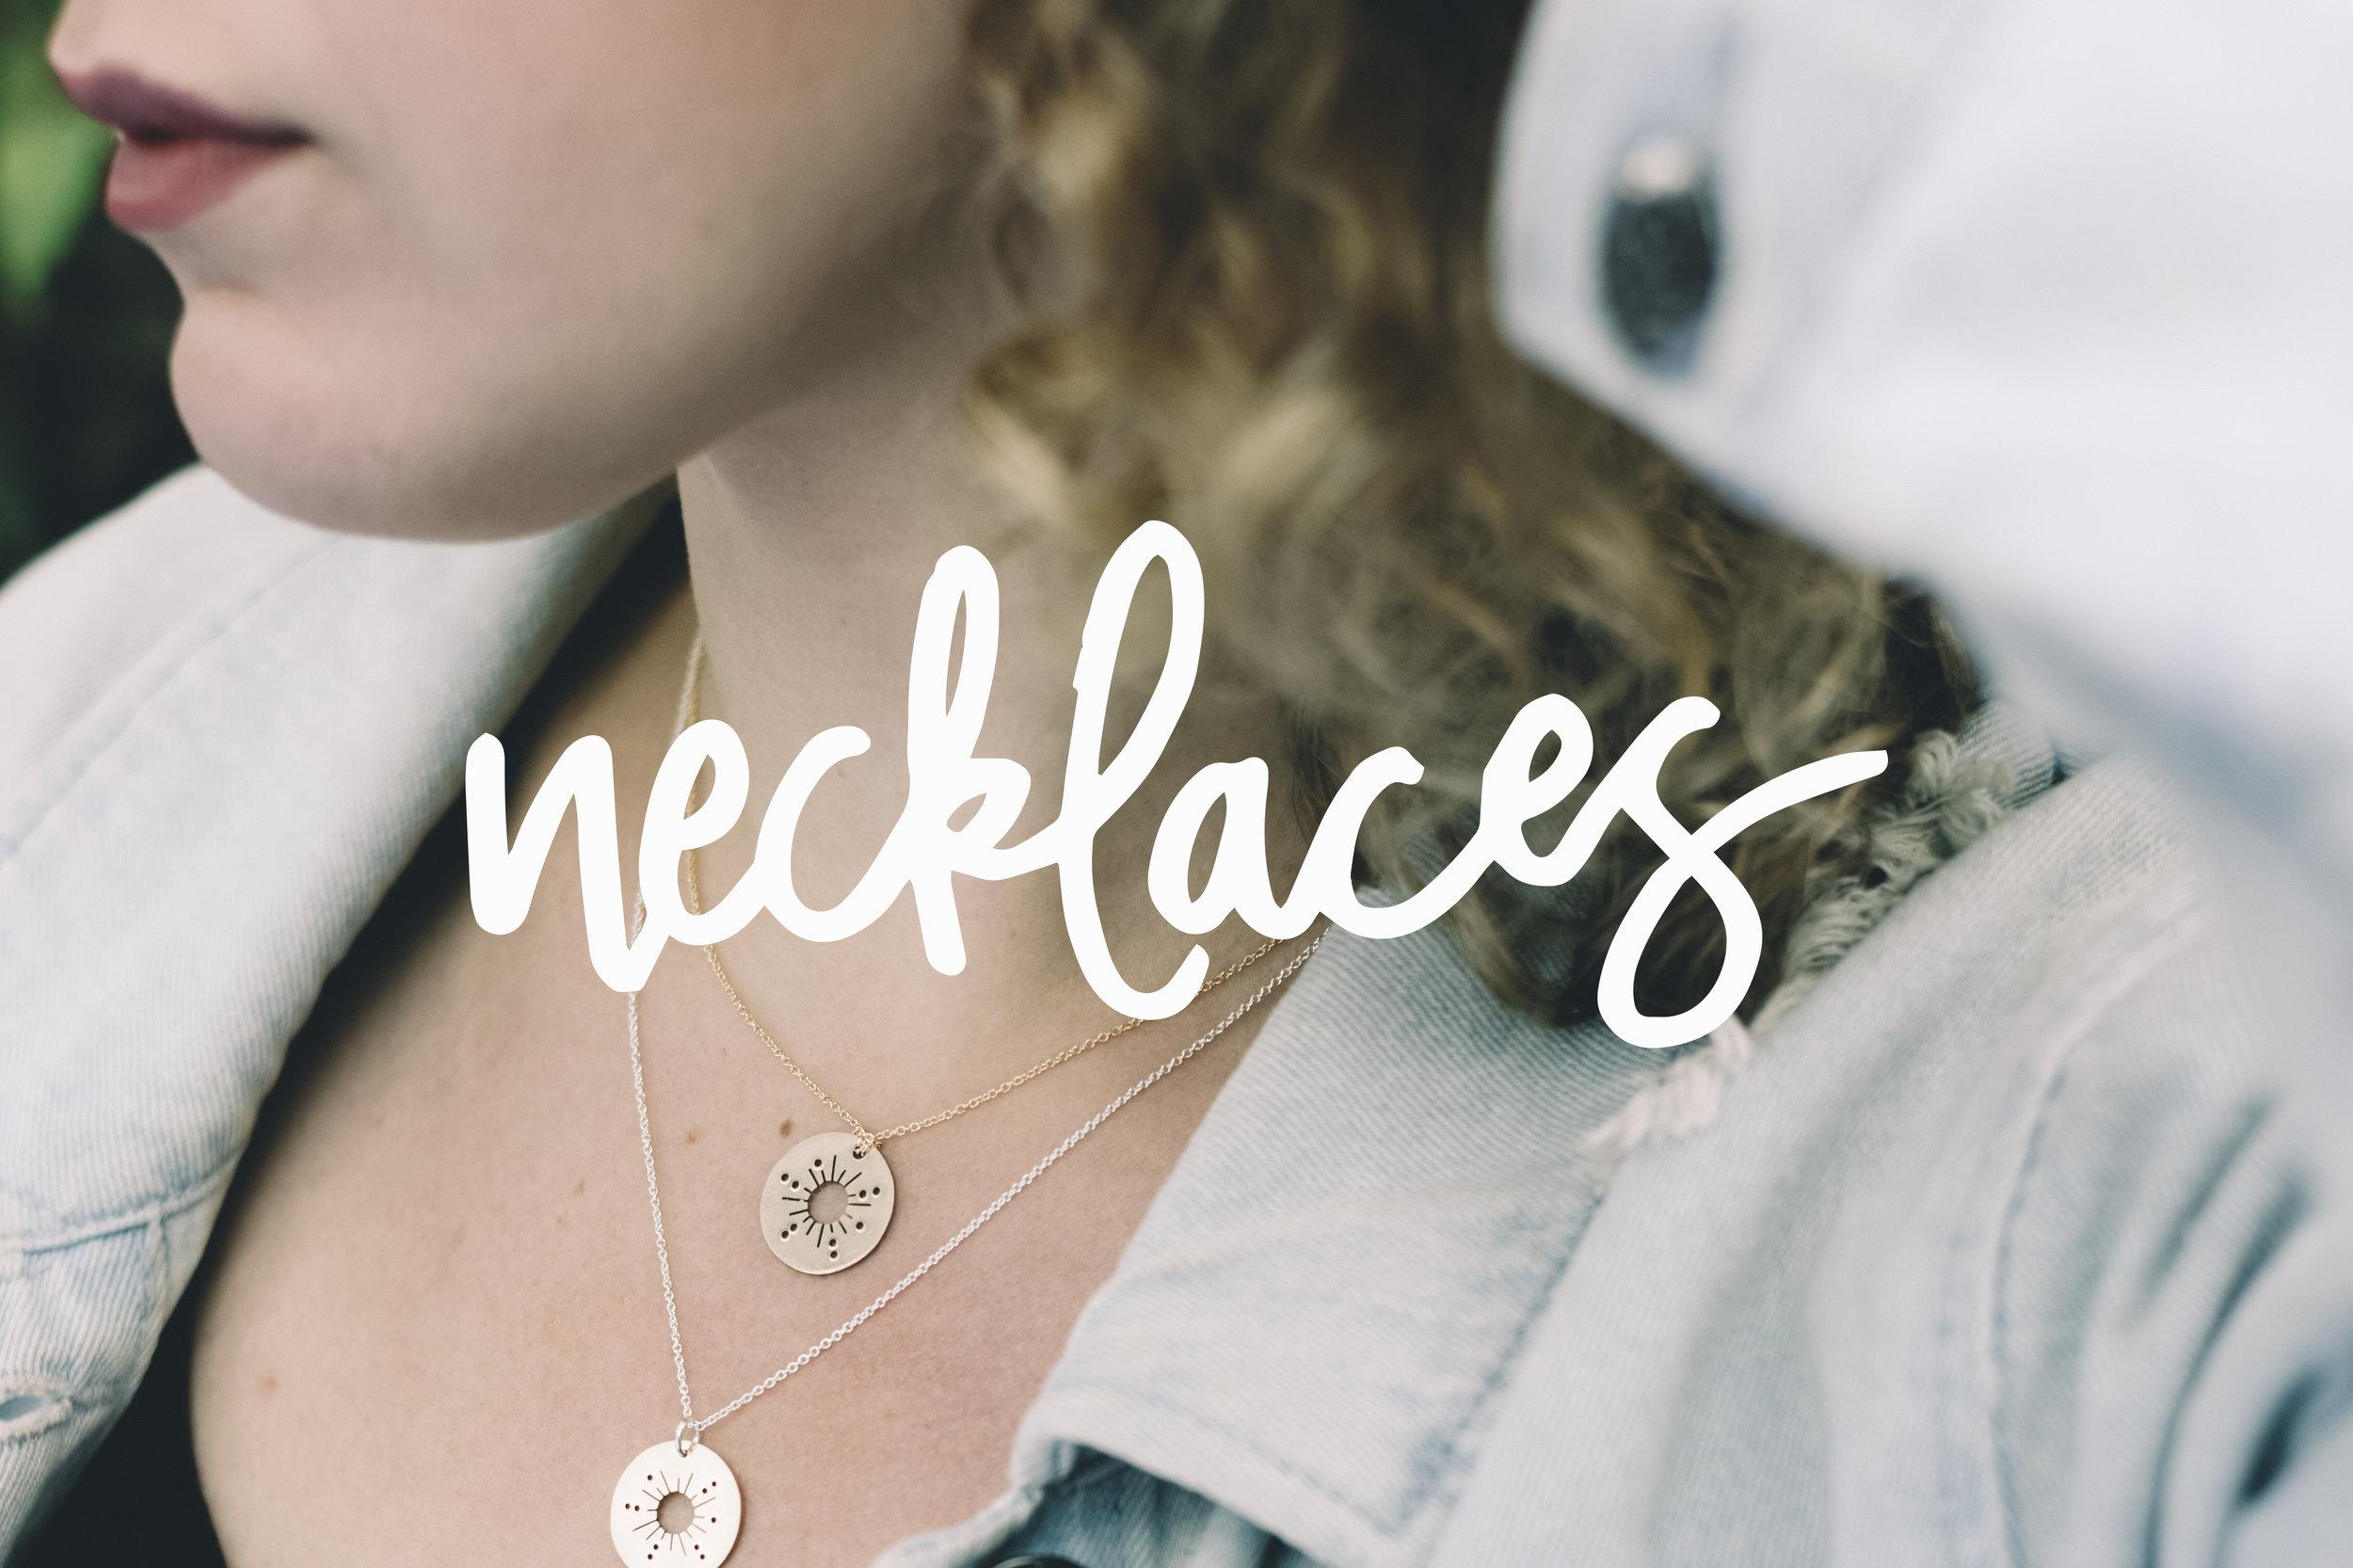 website_necklaces_button.jpg